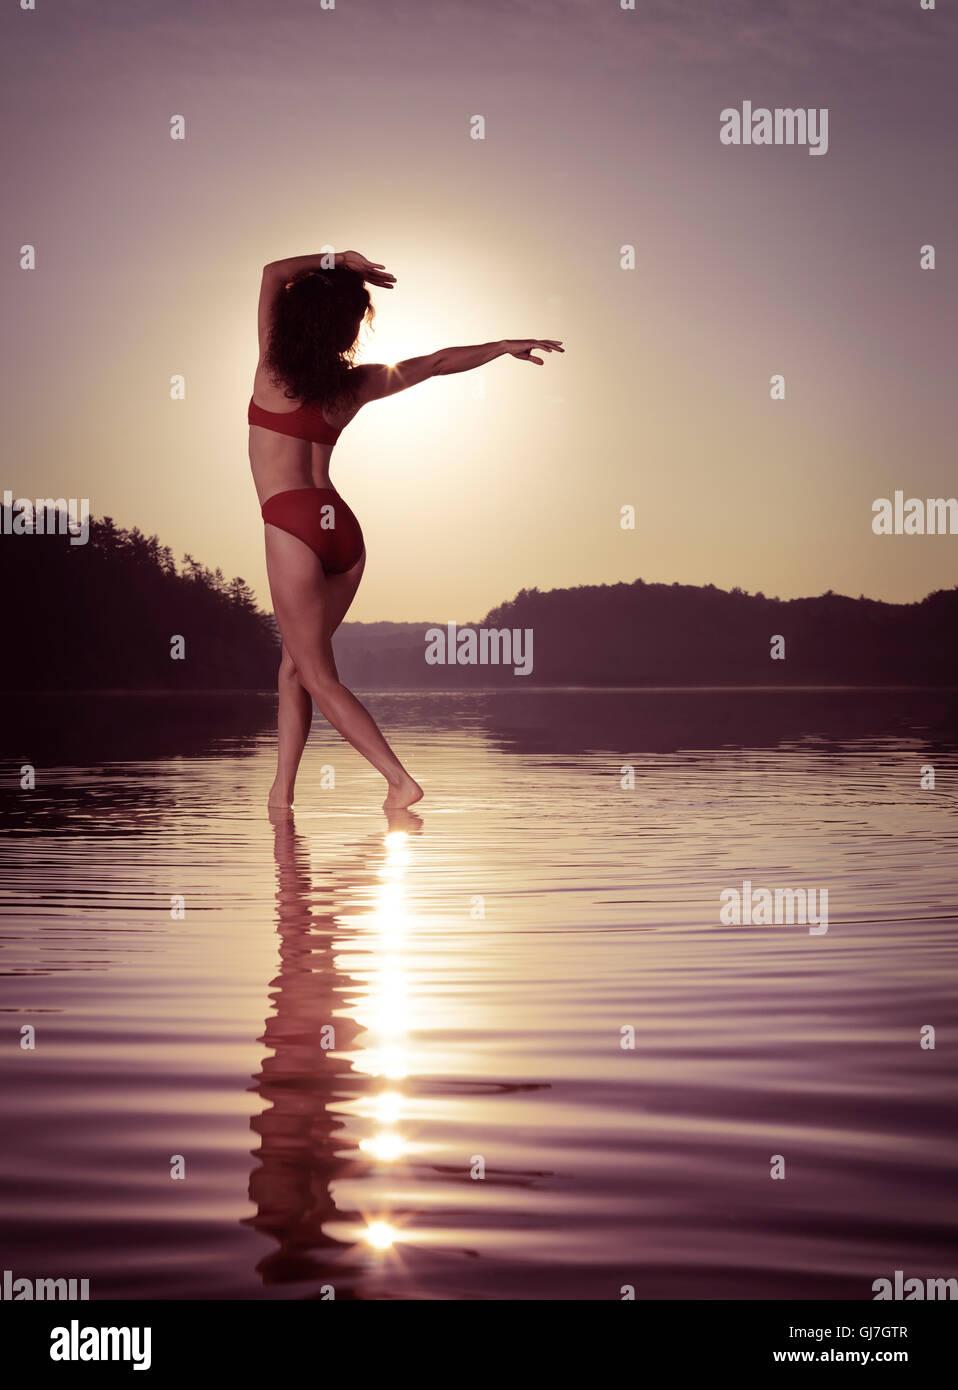 Young woman in swimsuit dancing in the sun on the water in beautiful morning sunrise scenery. Muskoka, Ontario, - Stock Image